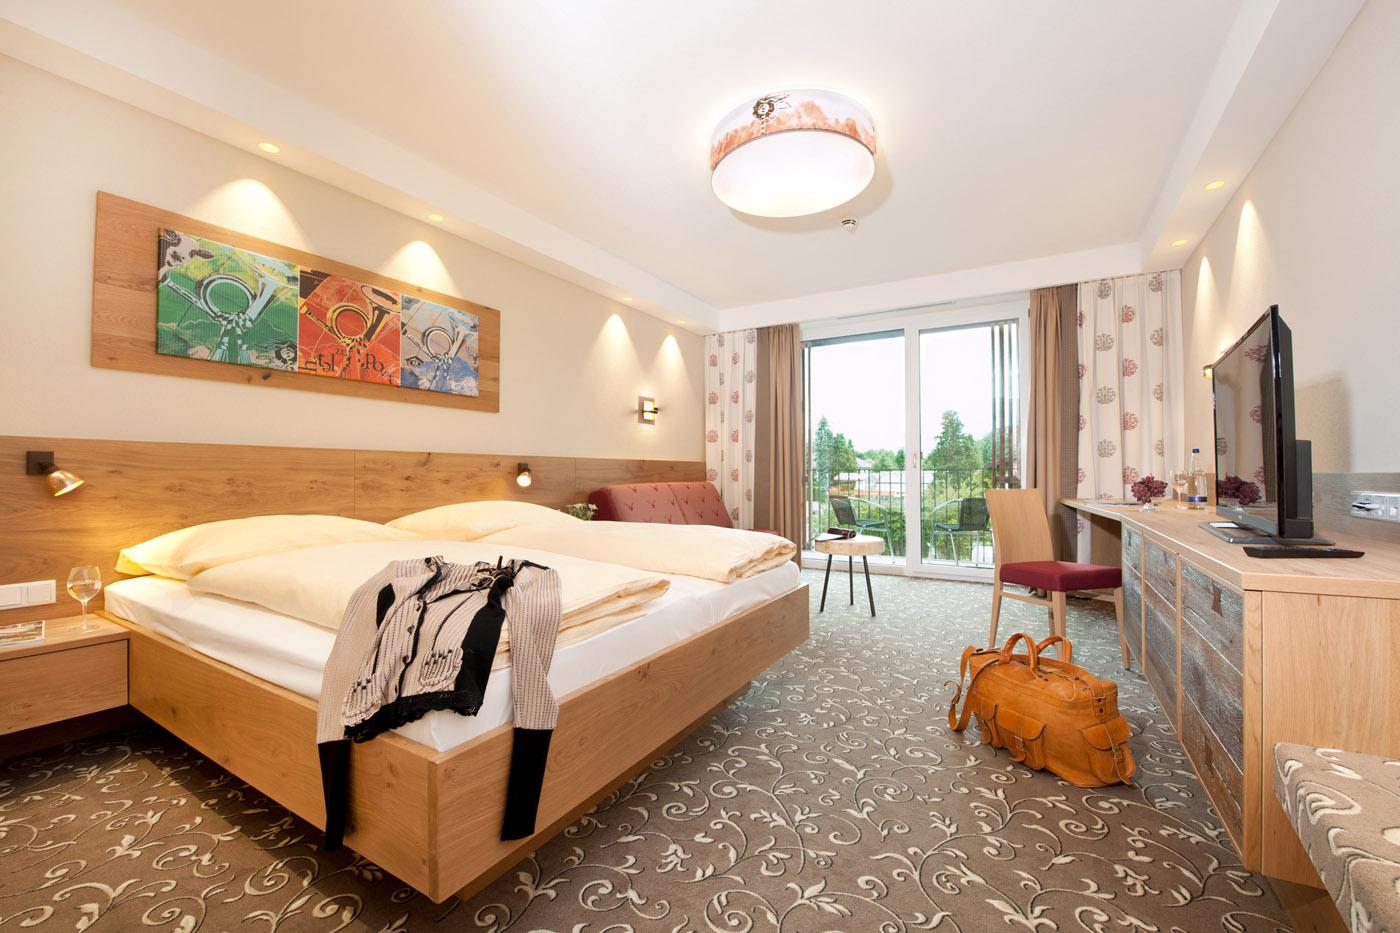 rohrdorf hotel zur post. Black Bedroom Furniture Sets. Home Design Ideas